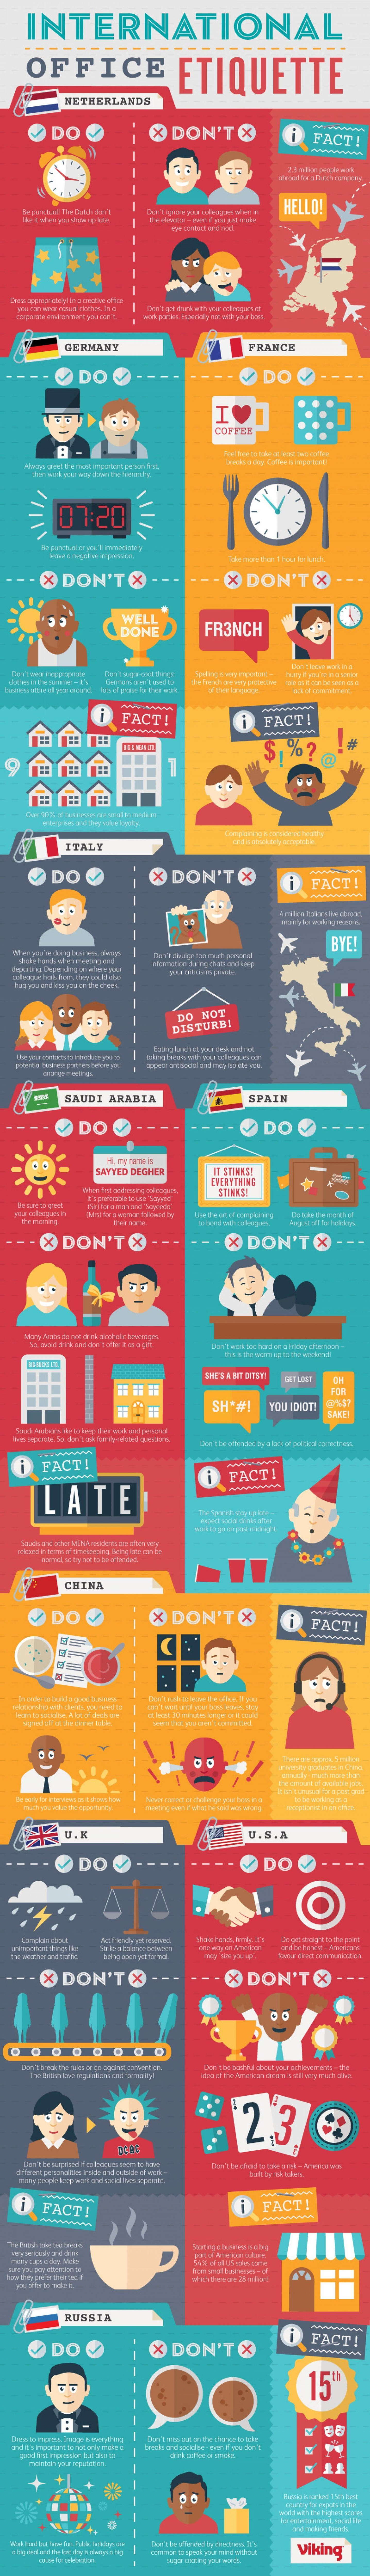 International Office Etiquette Infographic